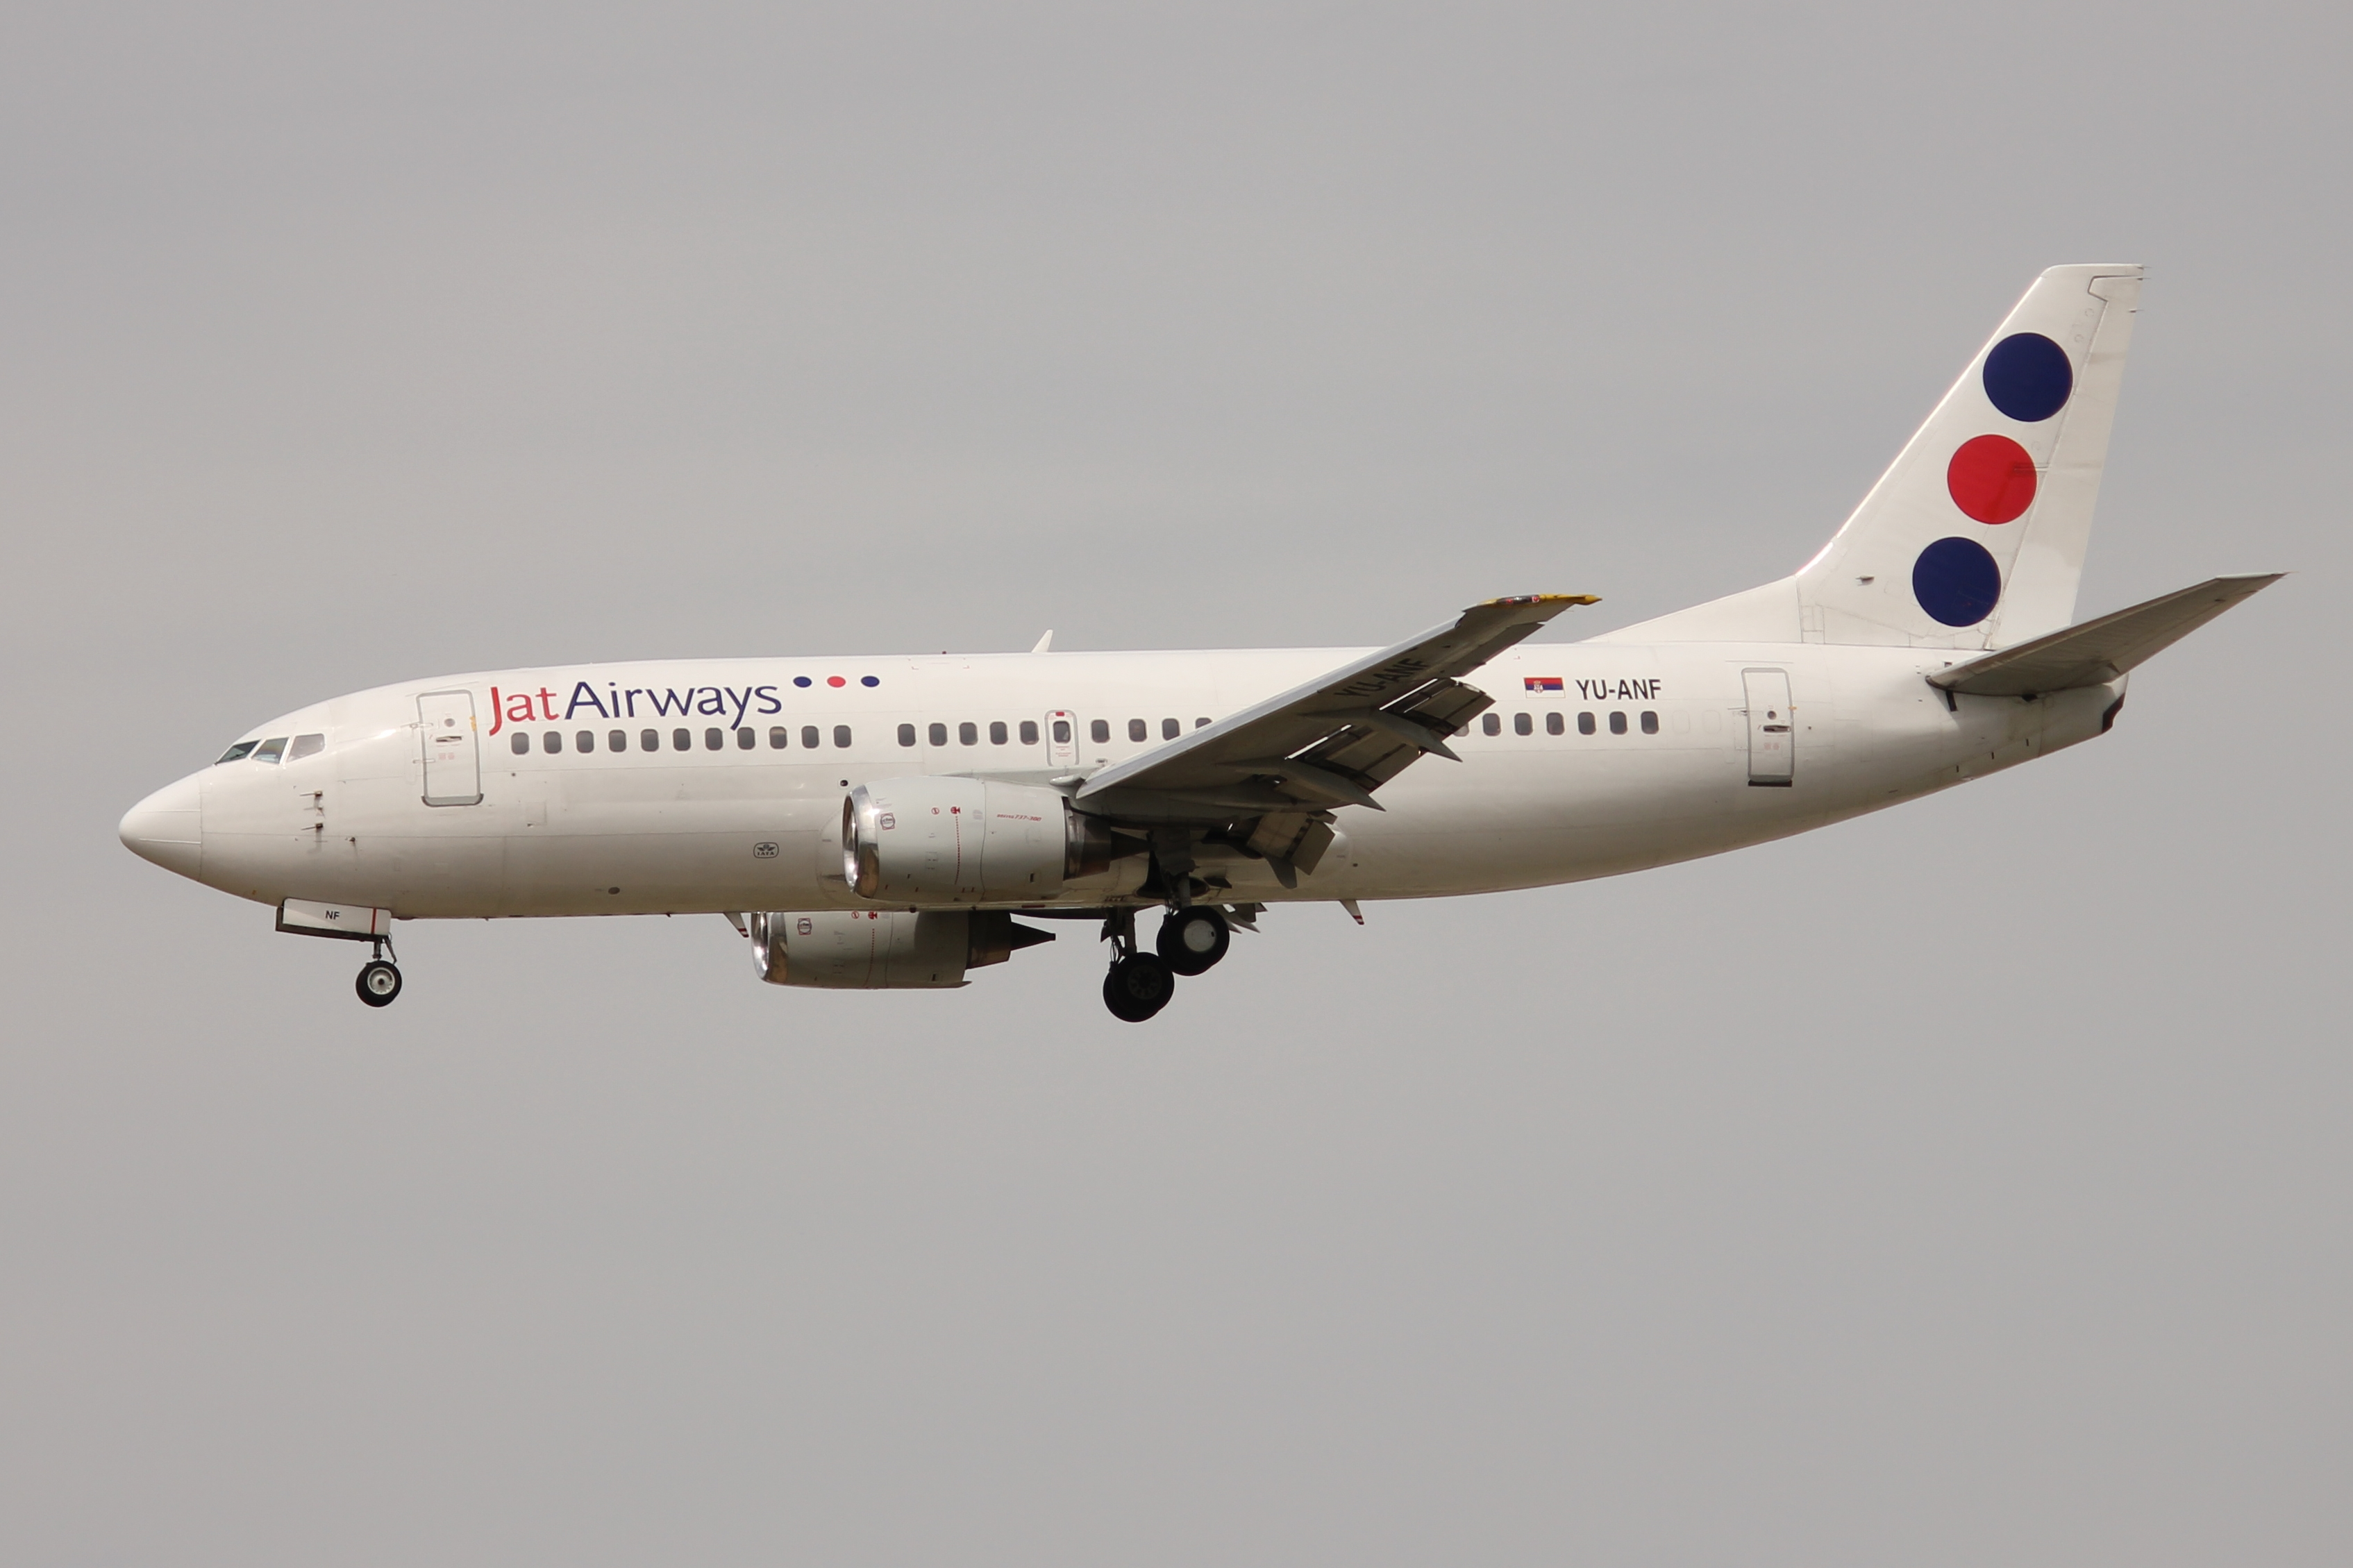 File:Jat Airways 733 YU-ANF.JPG